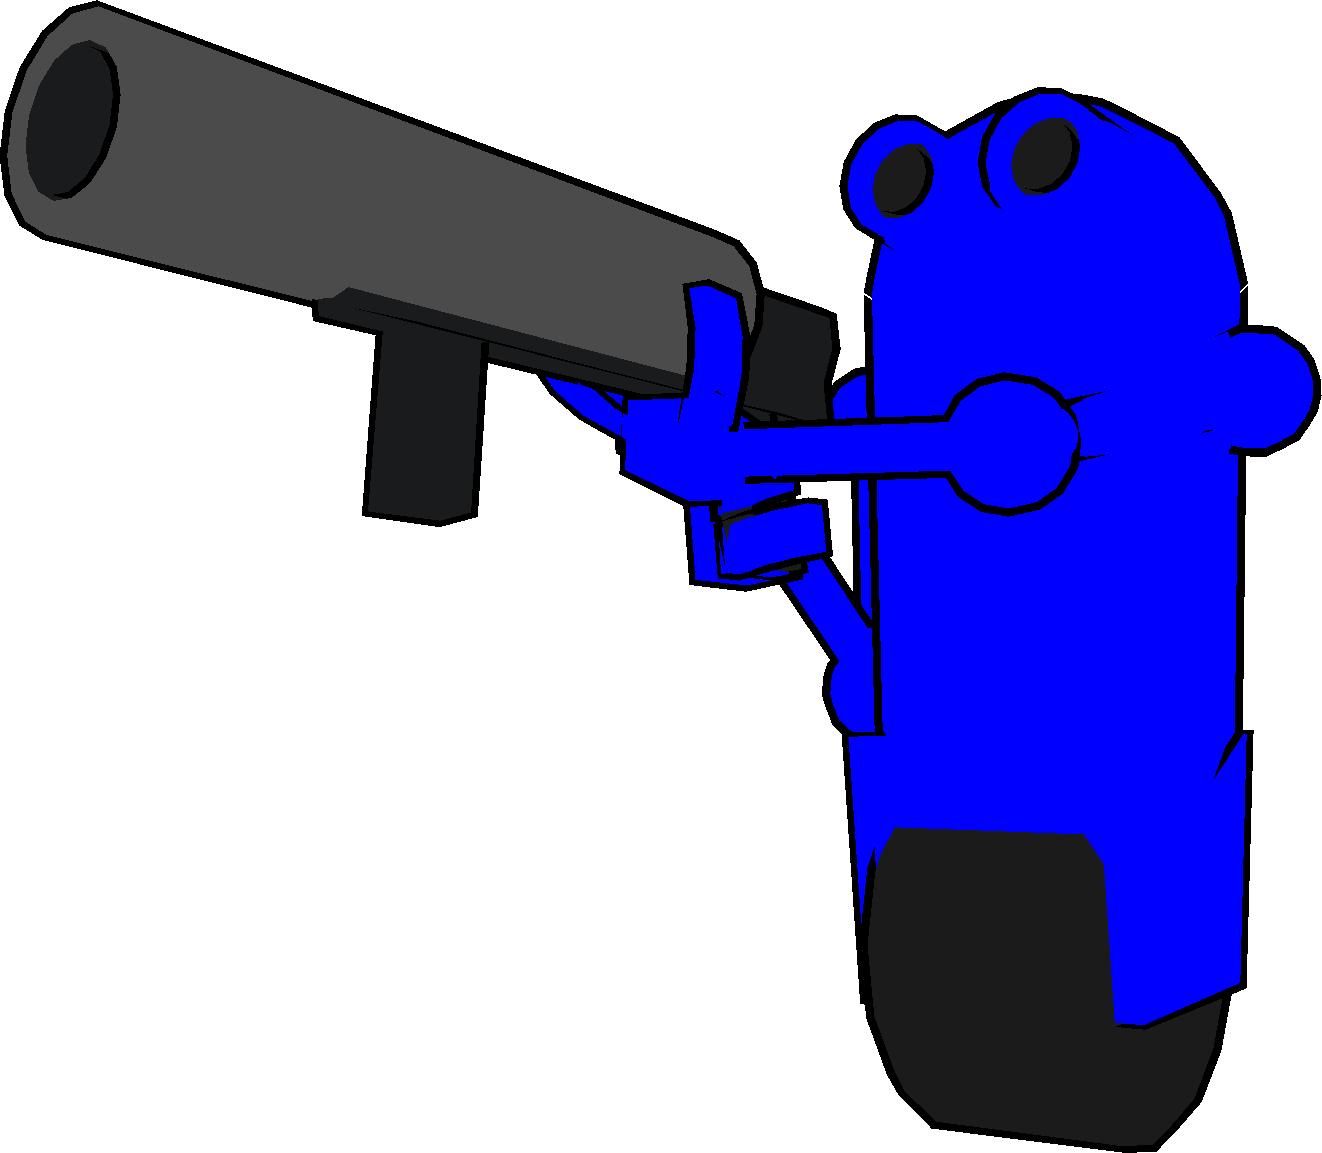 clipart black and white download Botcade windows mac linux. Guns clipart fps